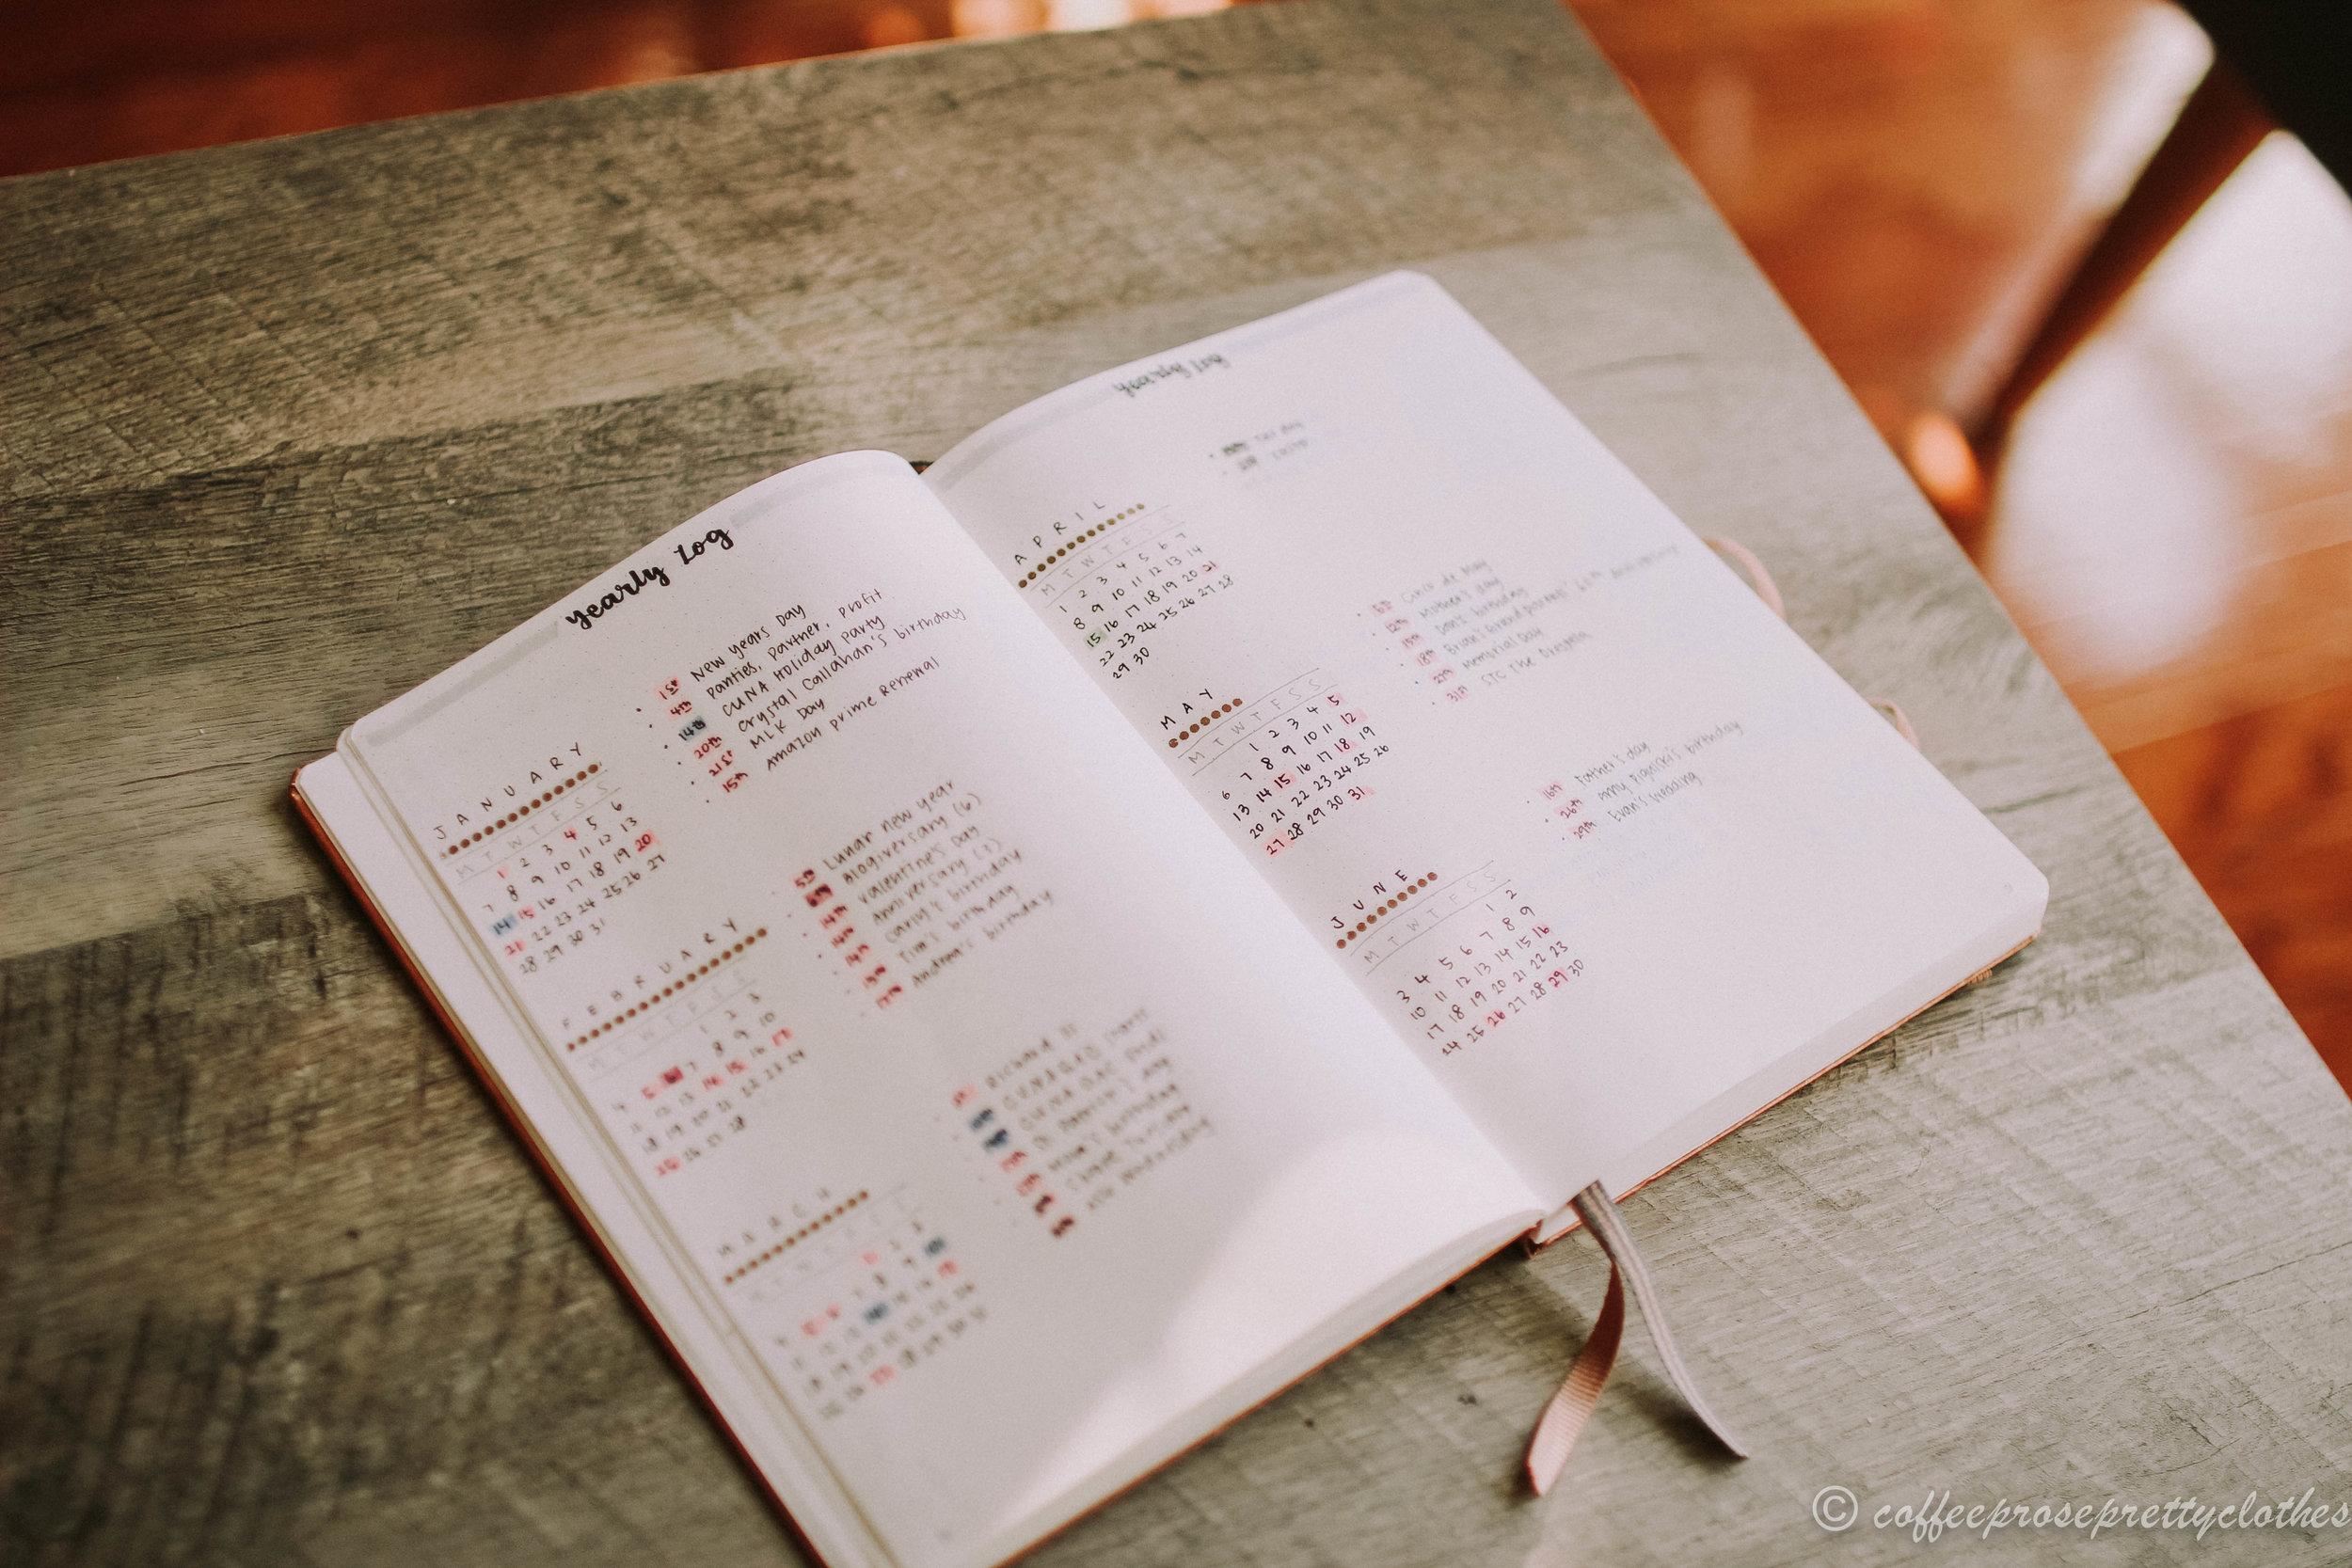 2019 Bullet Journal Setup Yearly log